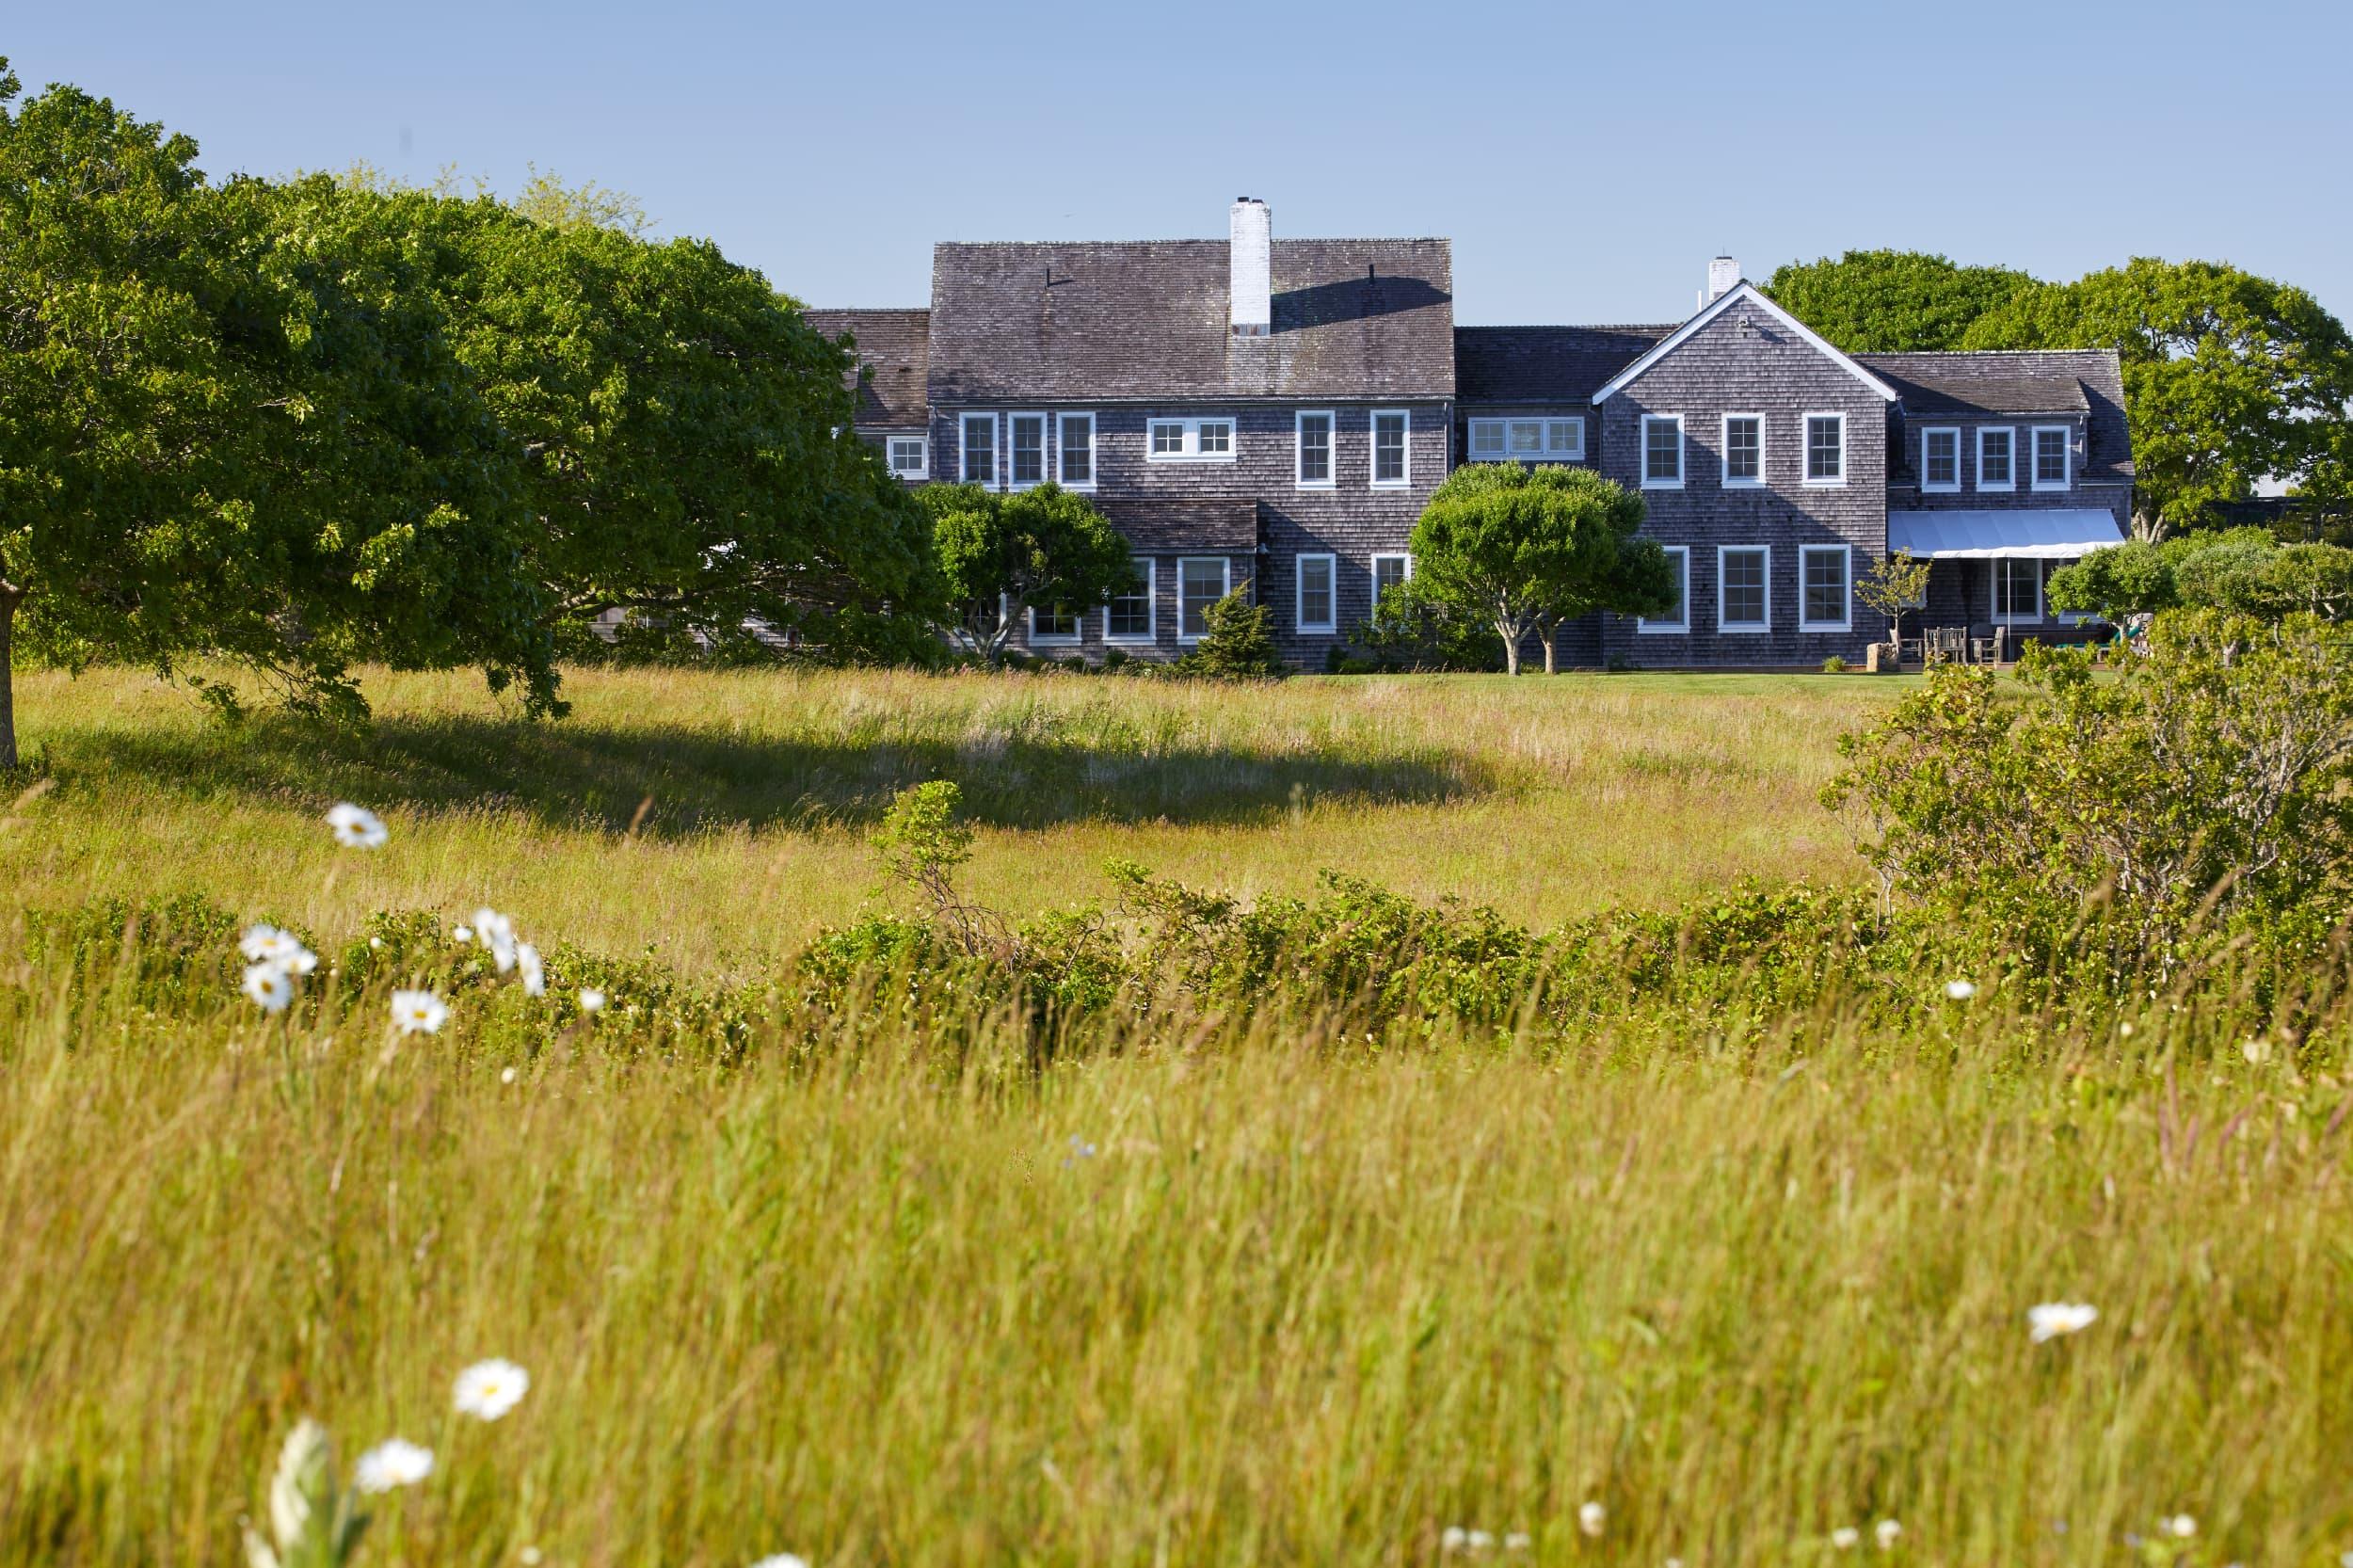 Photos: Jackie Kennedy Onassis' Martha's Vineyard summer